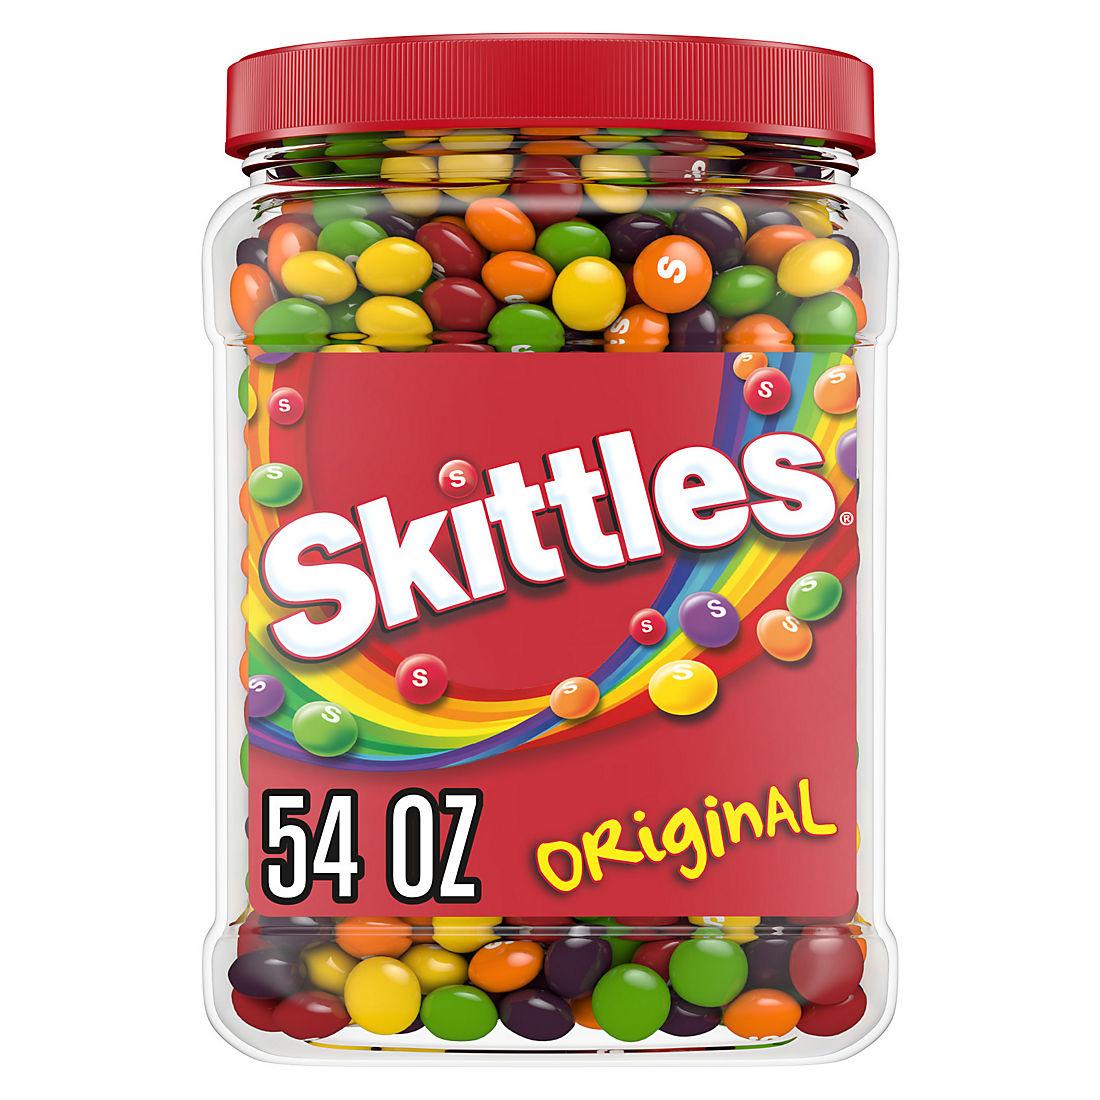 Skittles Original Fruity Candy Jar 54 Oz